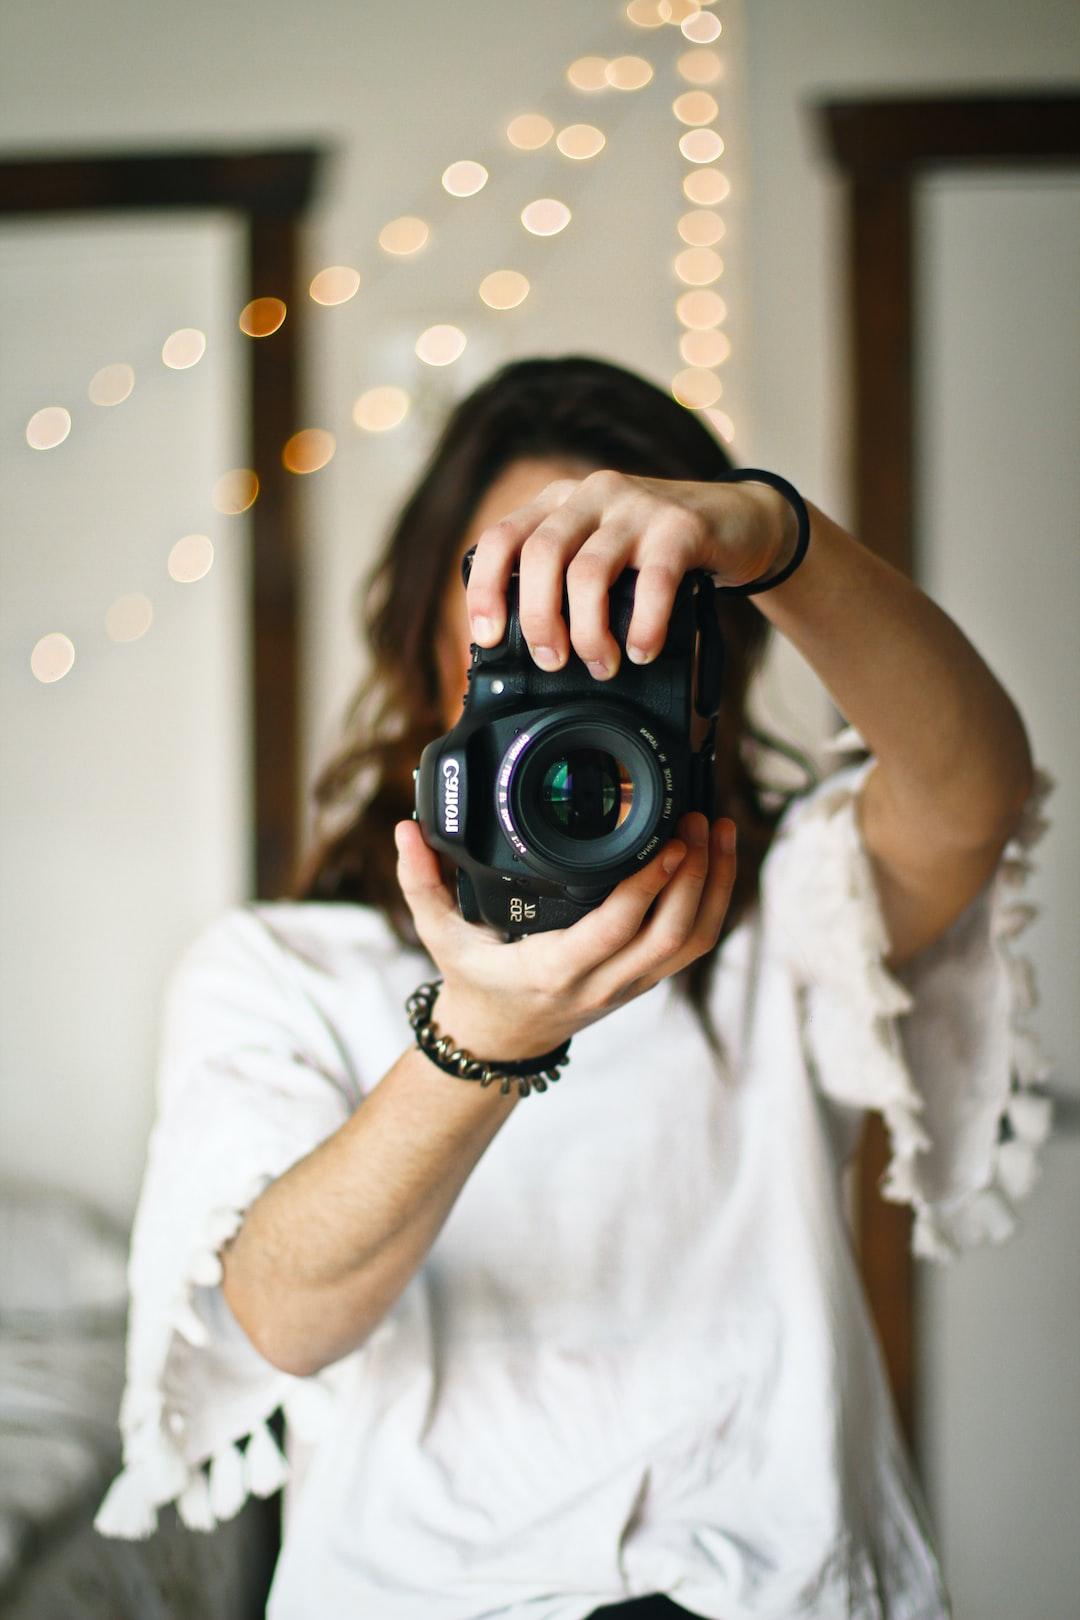 aesthetic photographer camera uitvaart digital take unsplash wesele tips fotograf kosztuje ile jennadesigns fotografia hd arrangement floral kit holding fotograaf